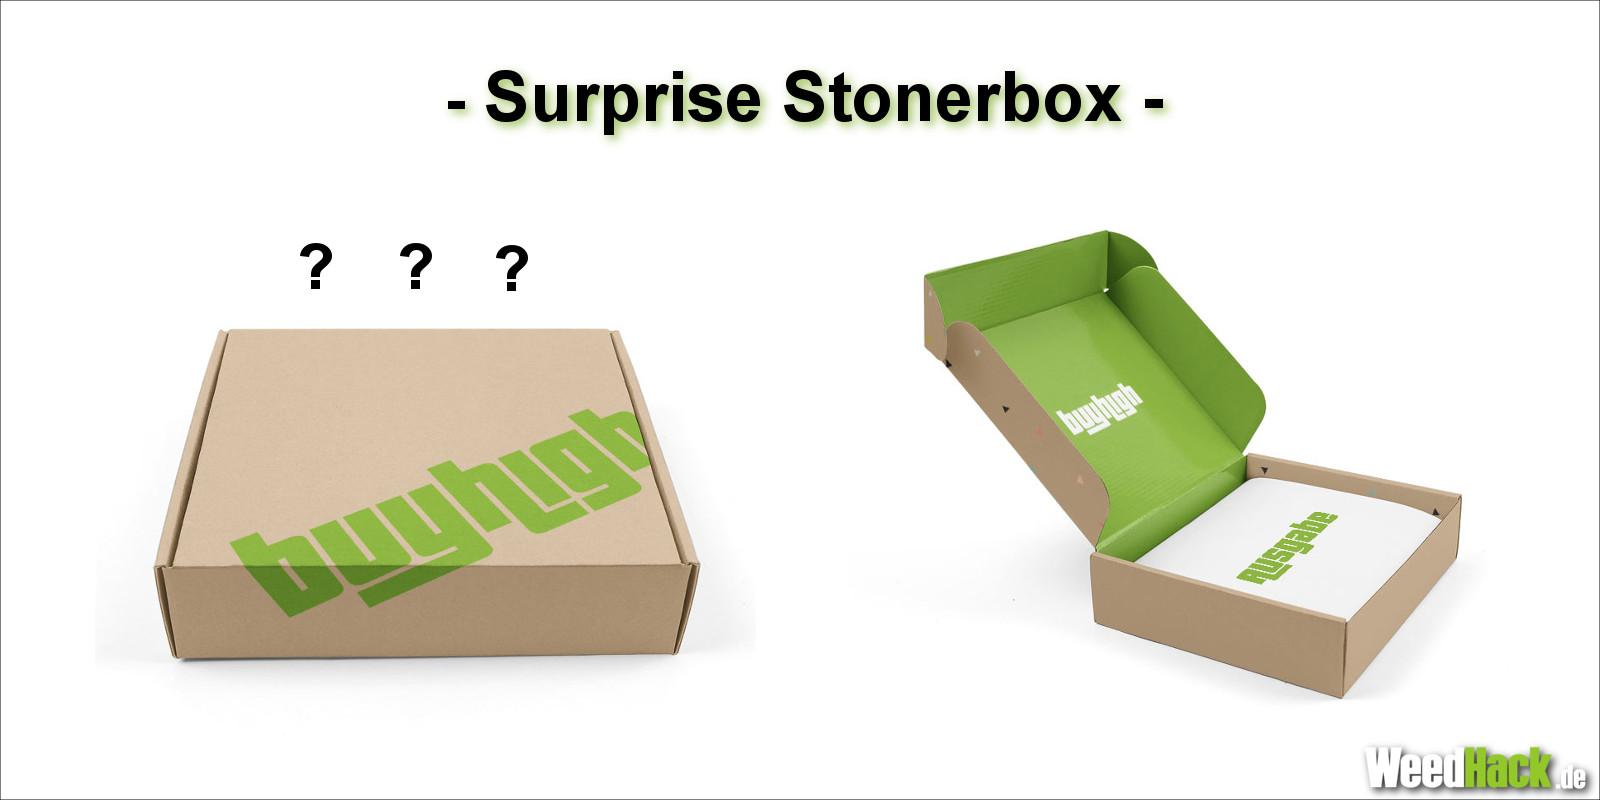 Stoner Box